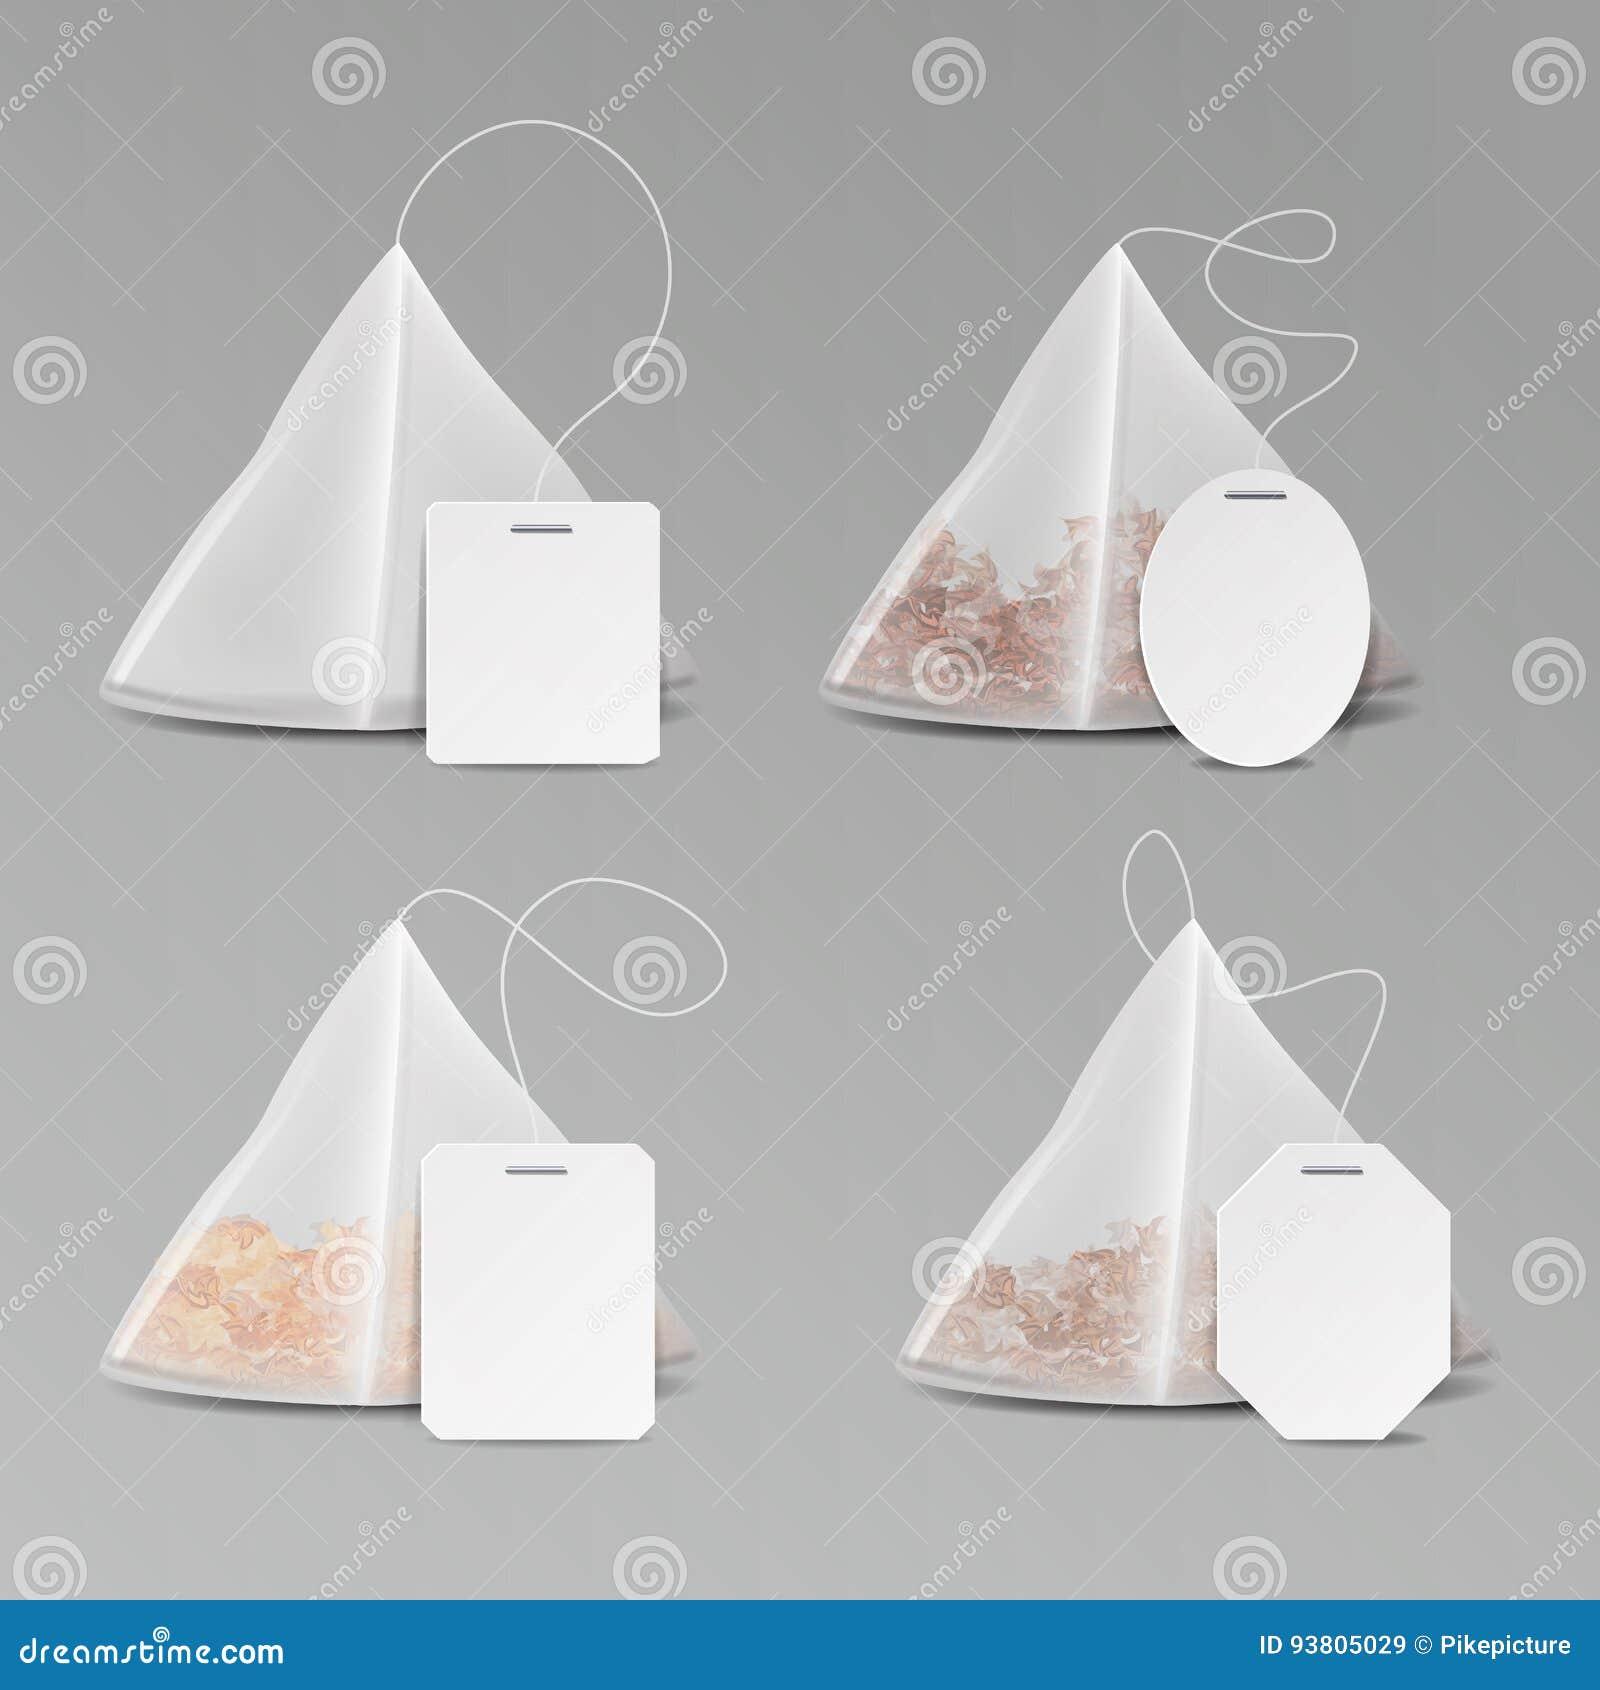 pyramid shape tea bag set mock up with empty square rectangle